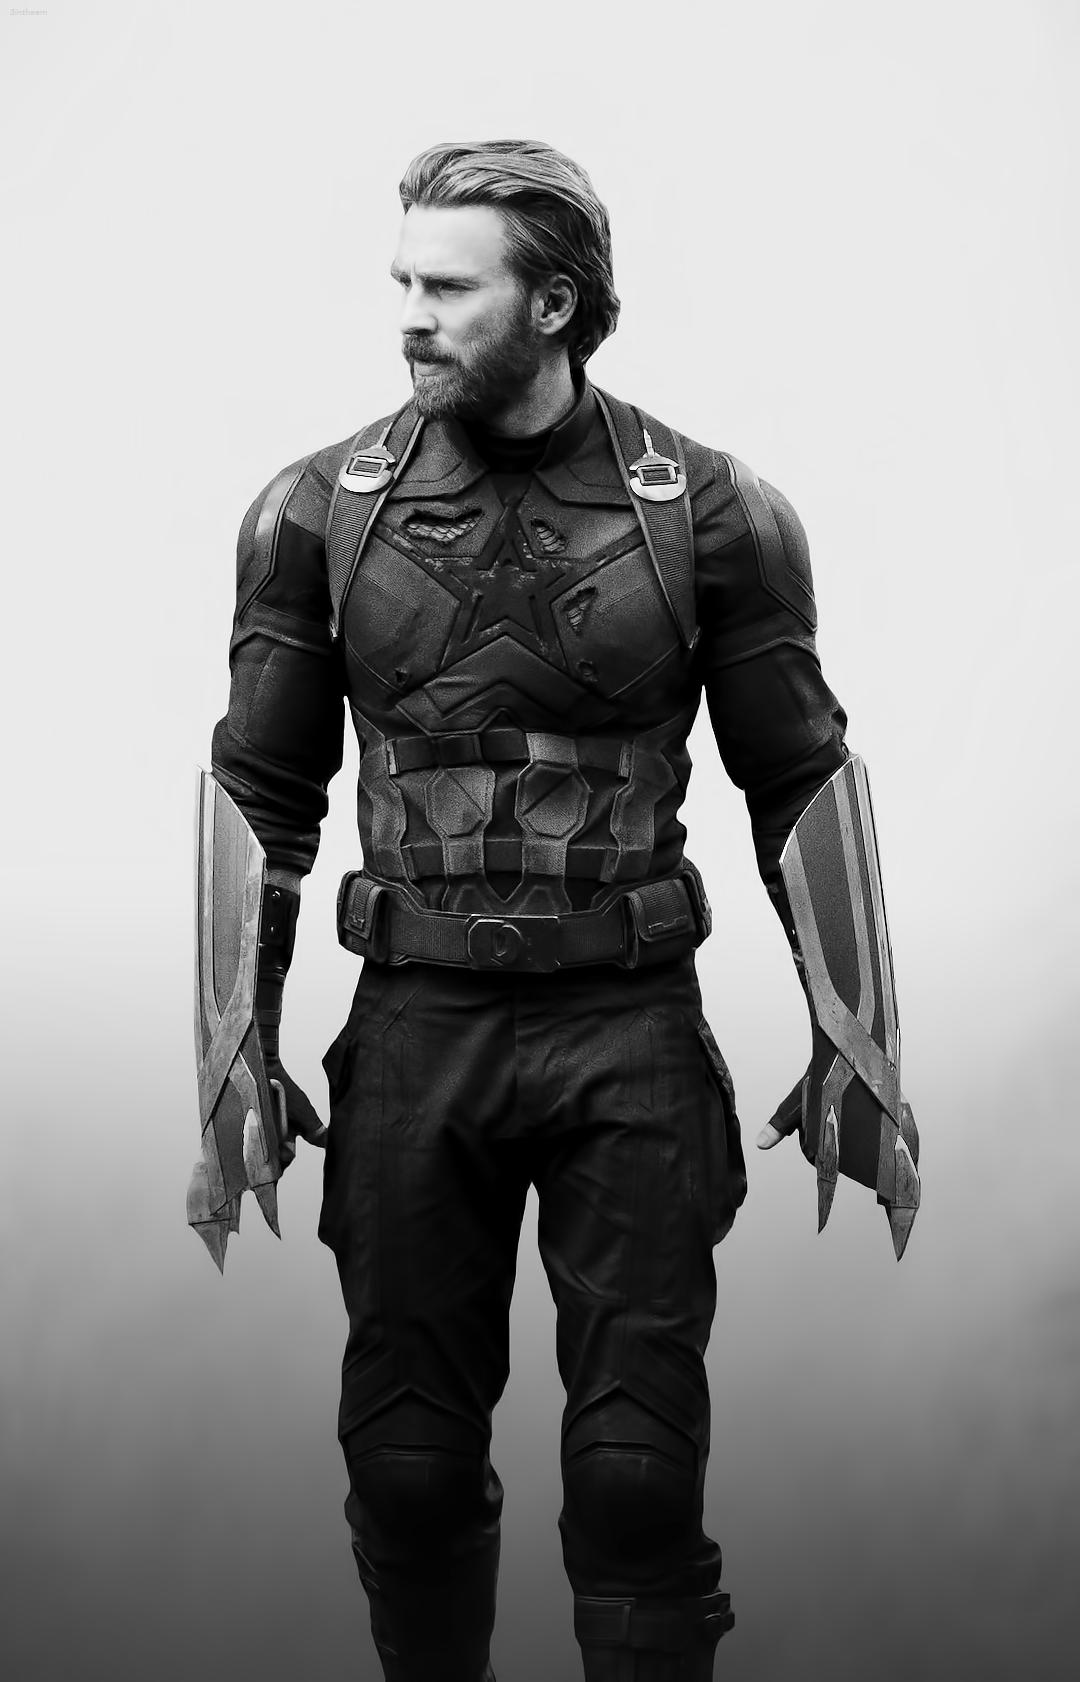 Обои Крис эванс, chris evans, мстители, steve rogers, captain america, the avengers. Фильмы